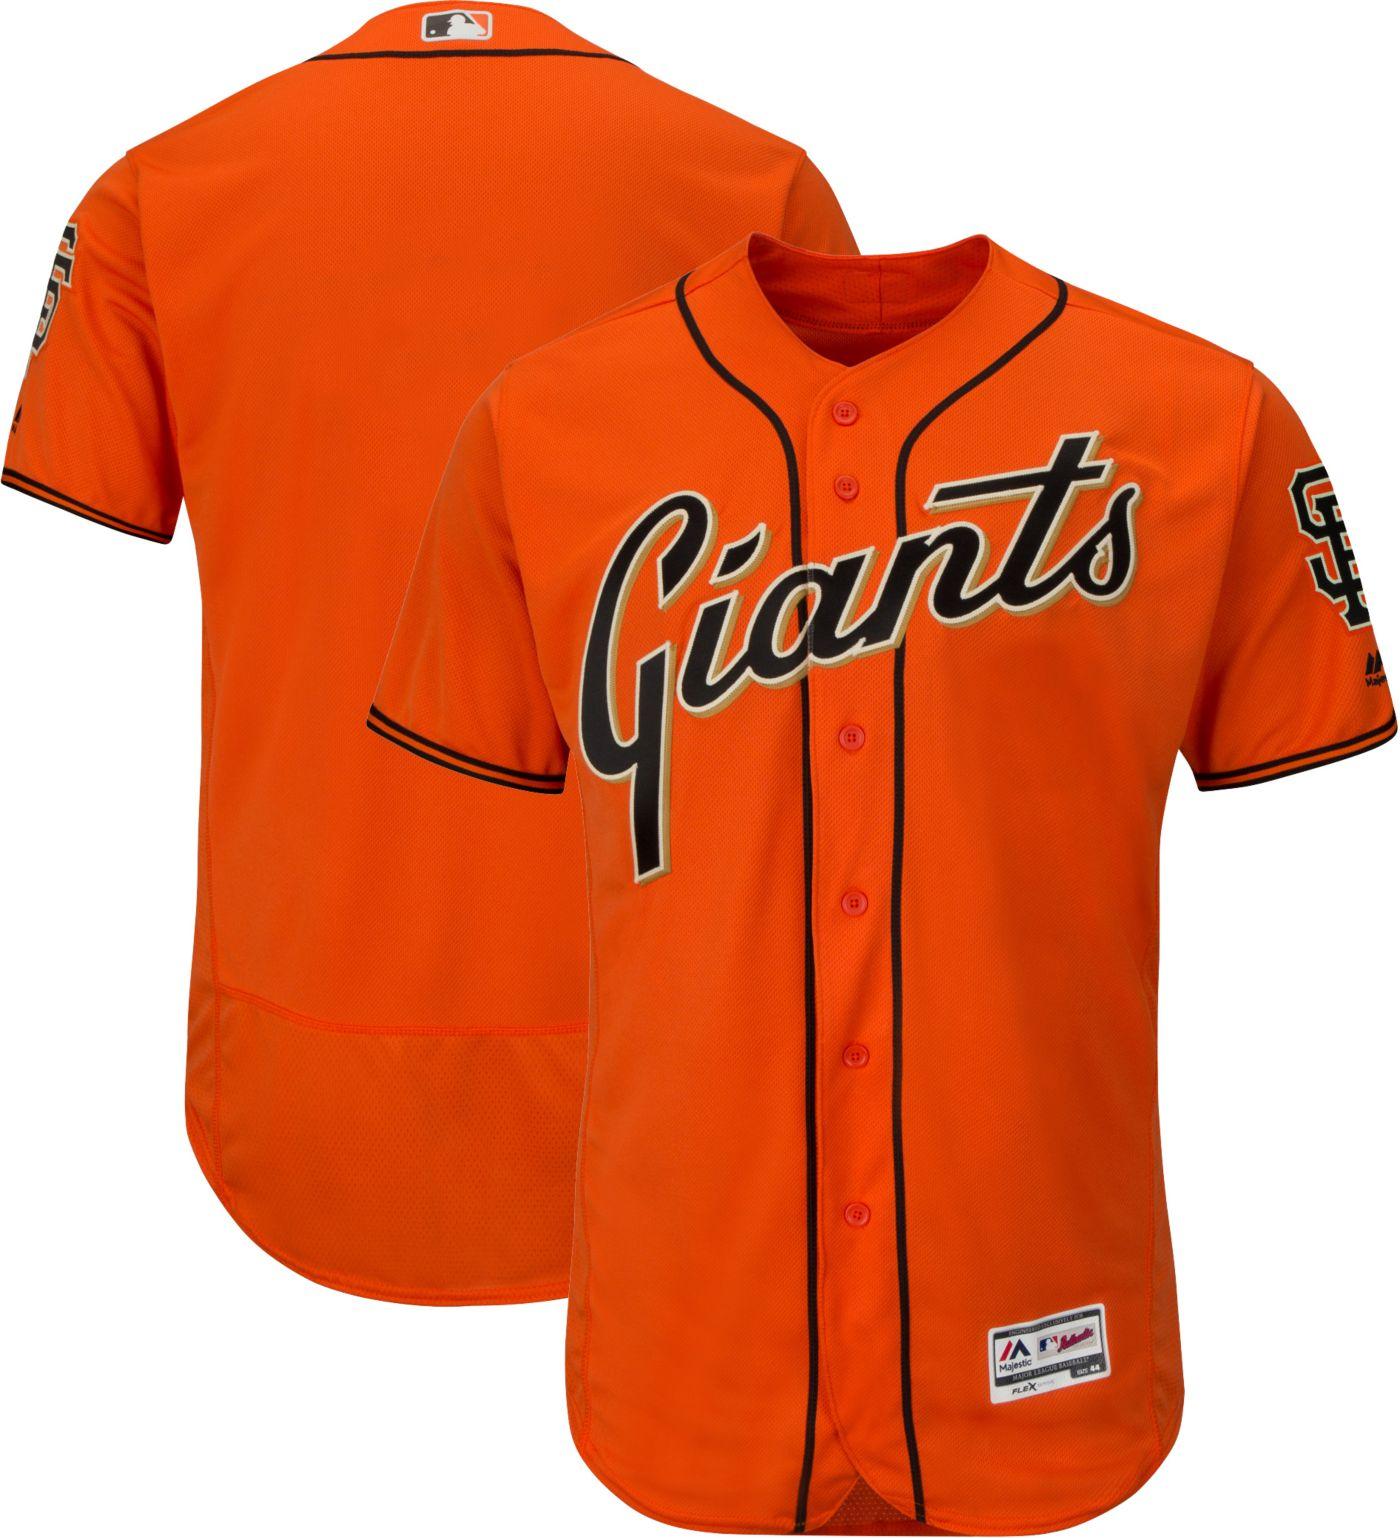 Majestic Men's Authentic San Francisco Giants Alternate Orange Flex Base On-Field Jersey